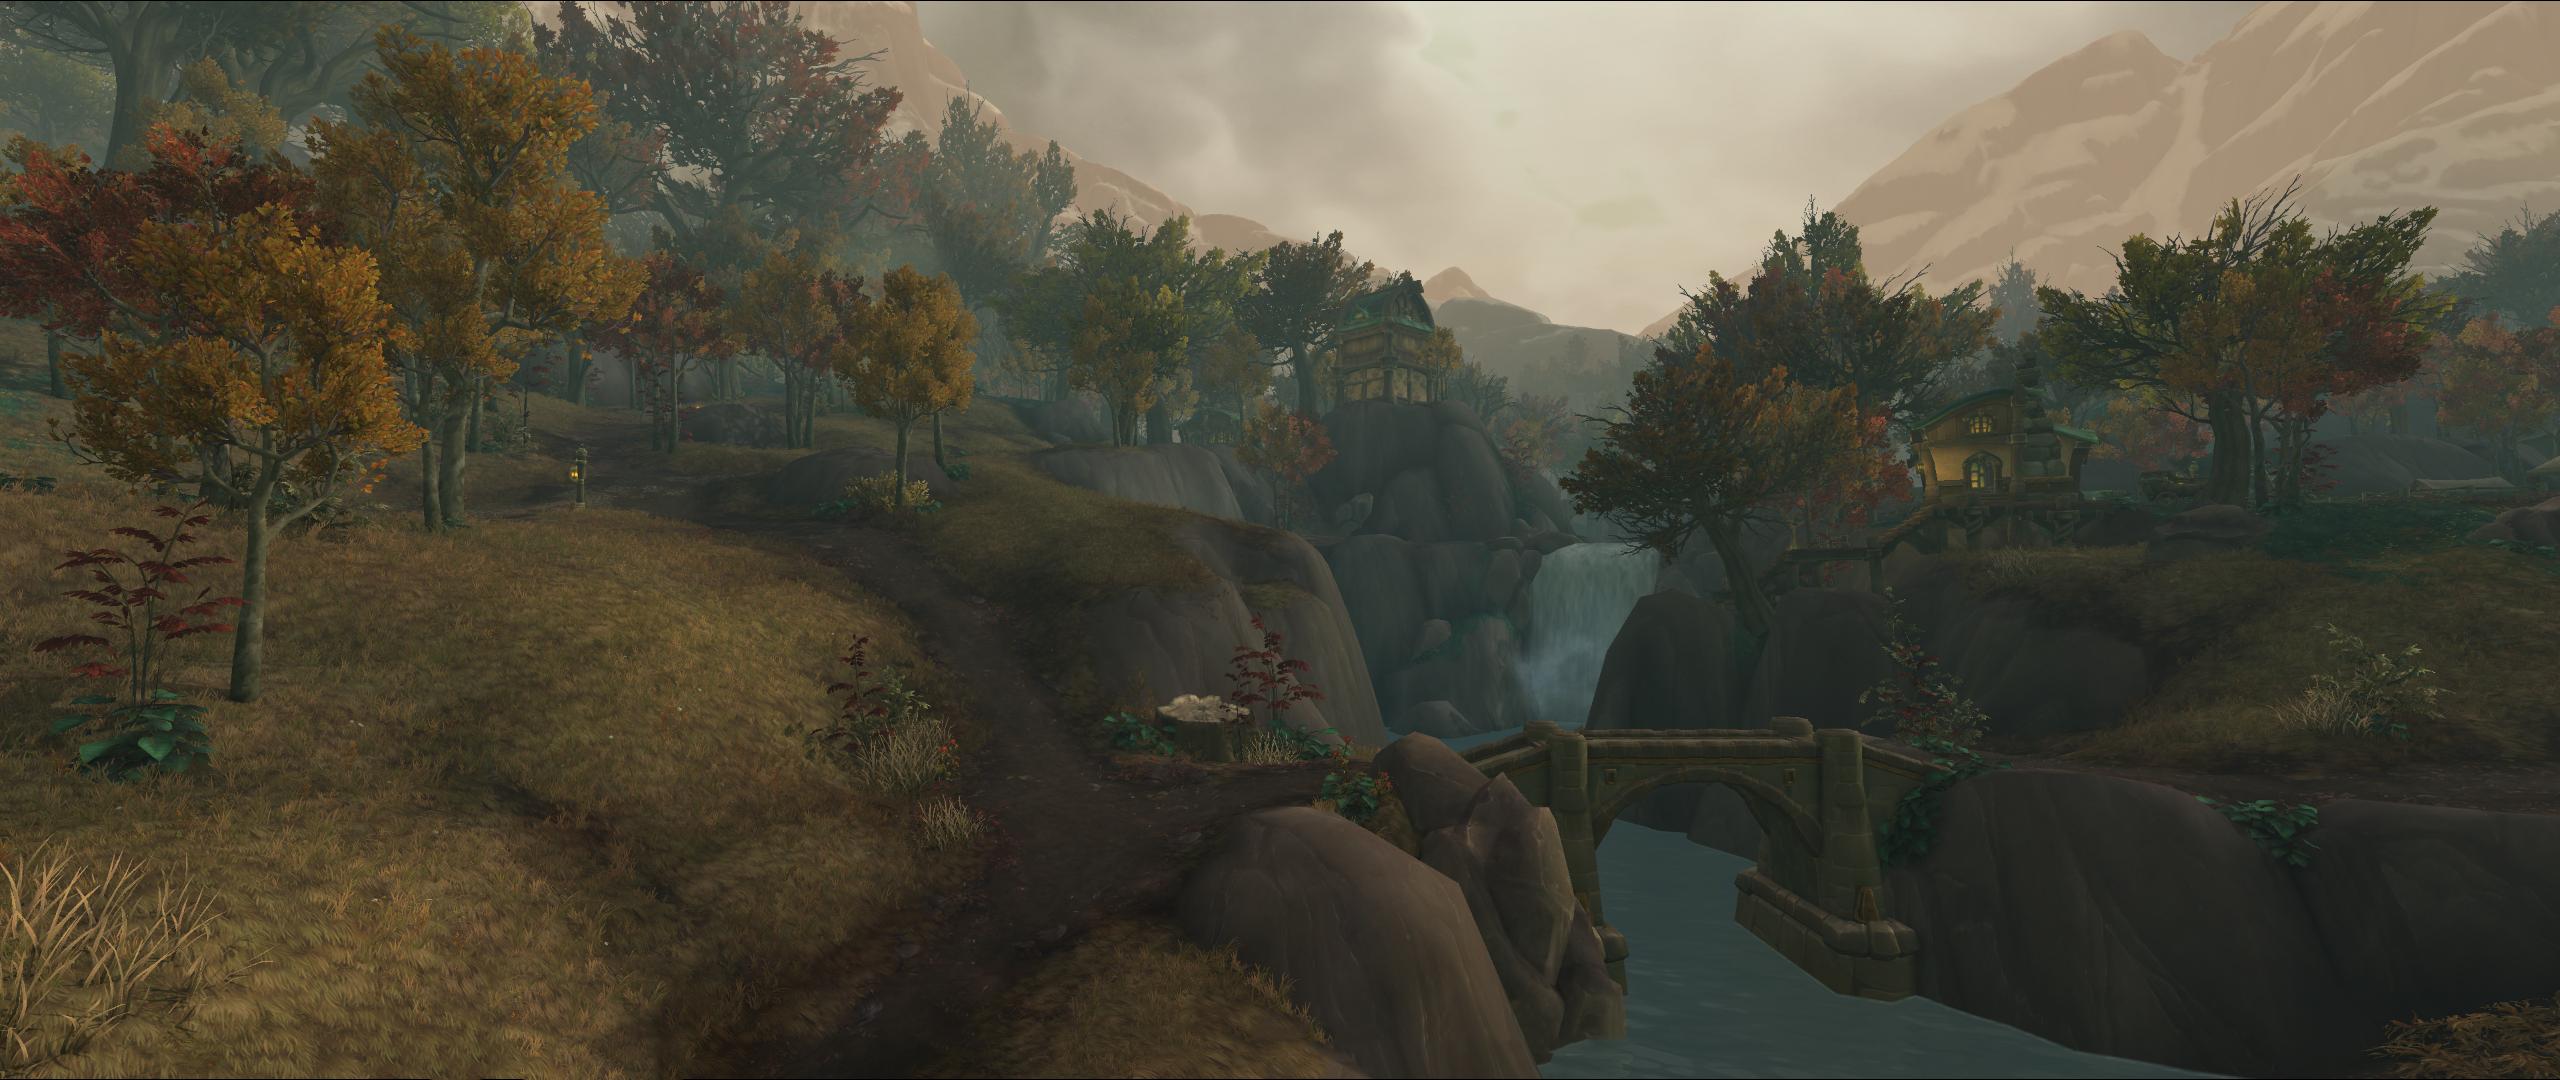 World Of Warcraft Screenshot 2018.08.18 - 17.10.10.35.png - World of Warcraft